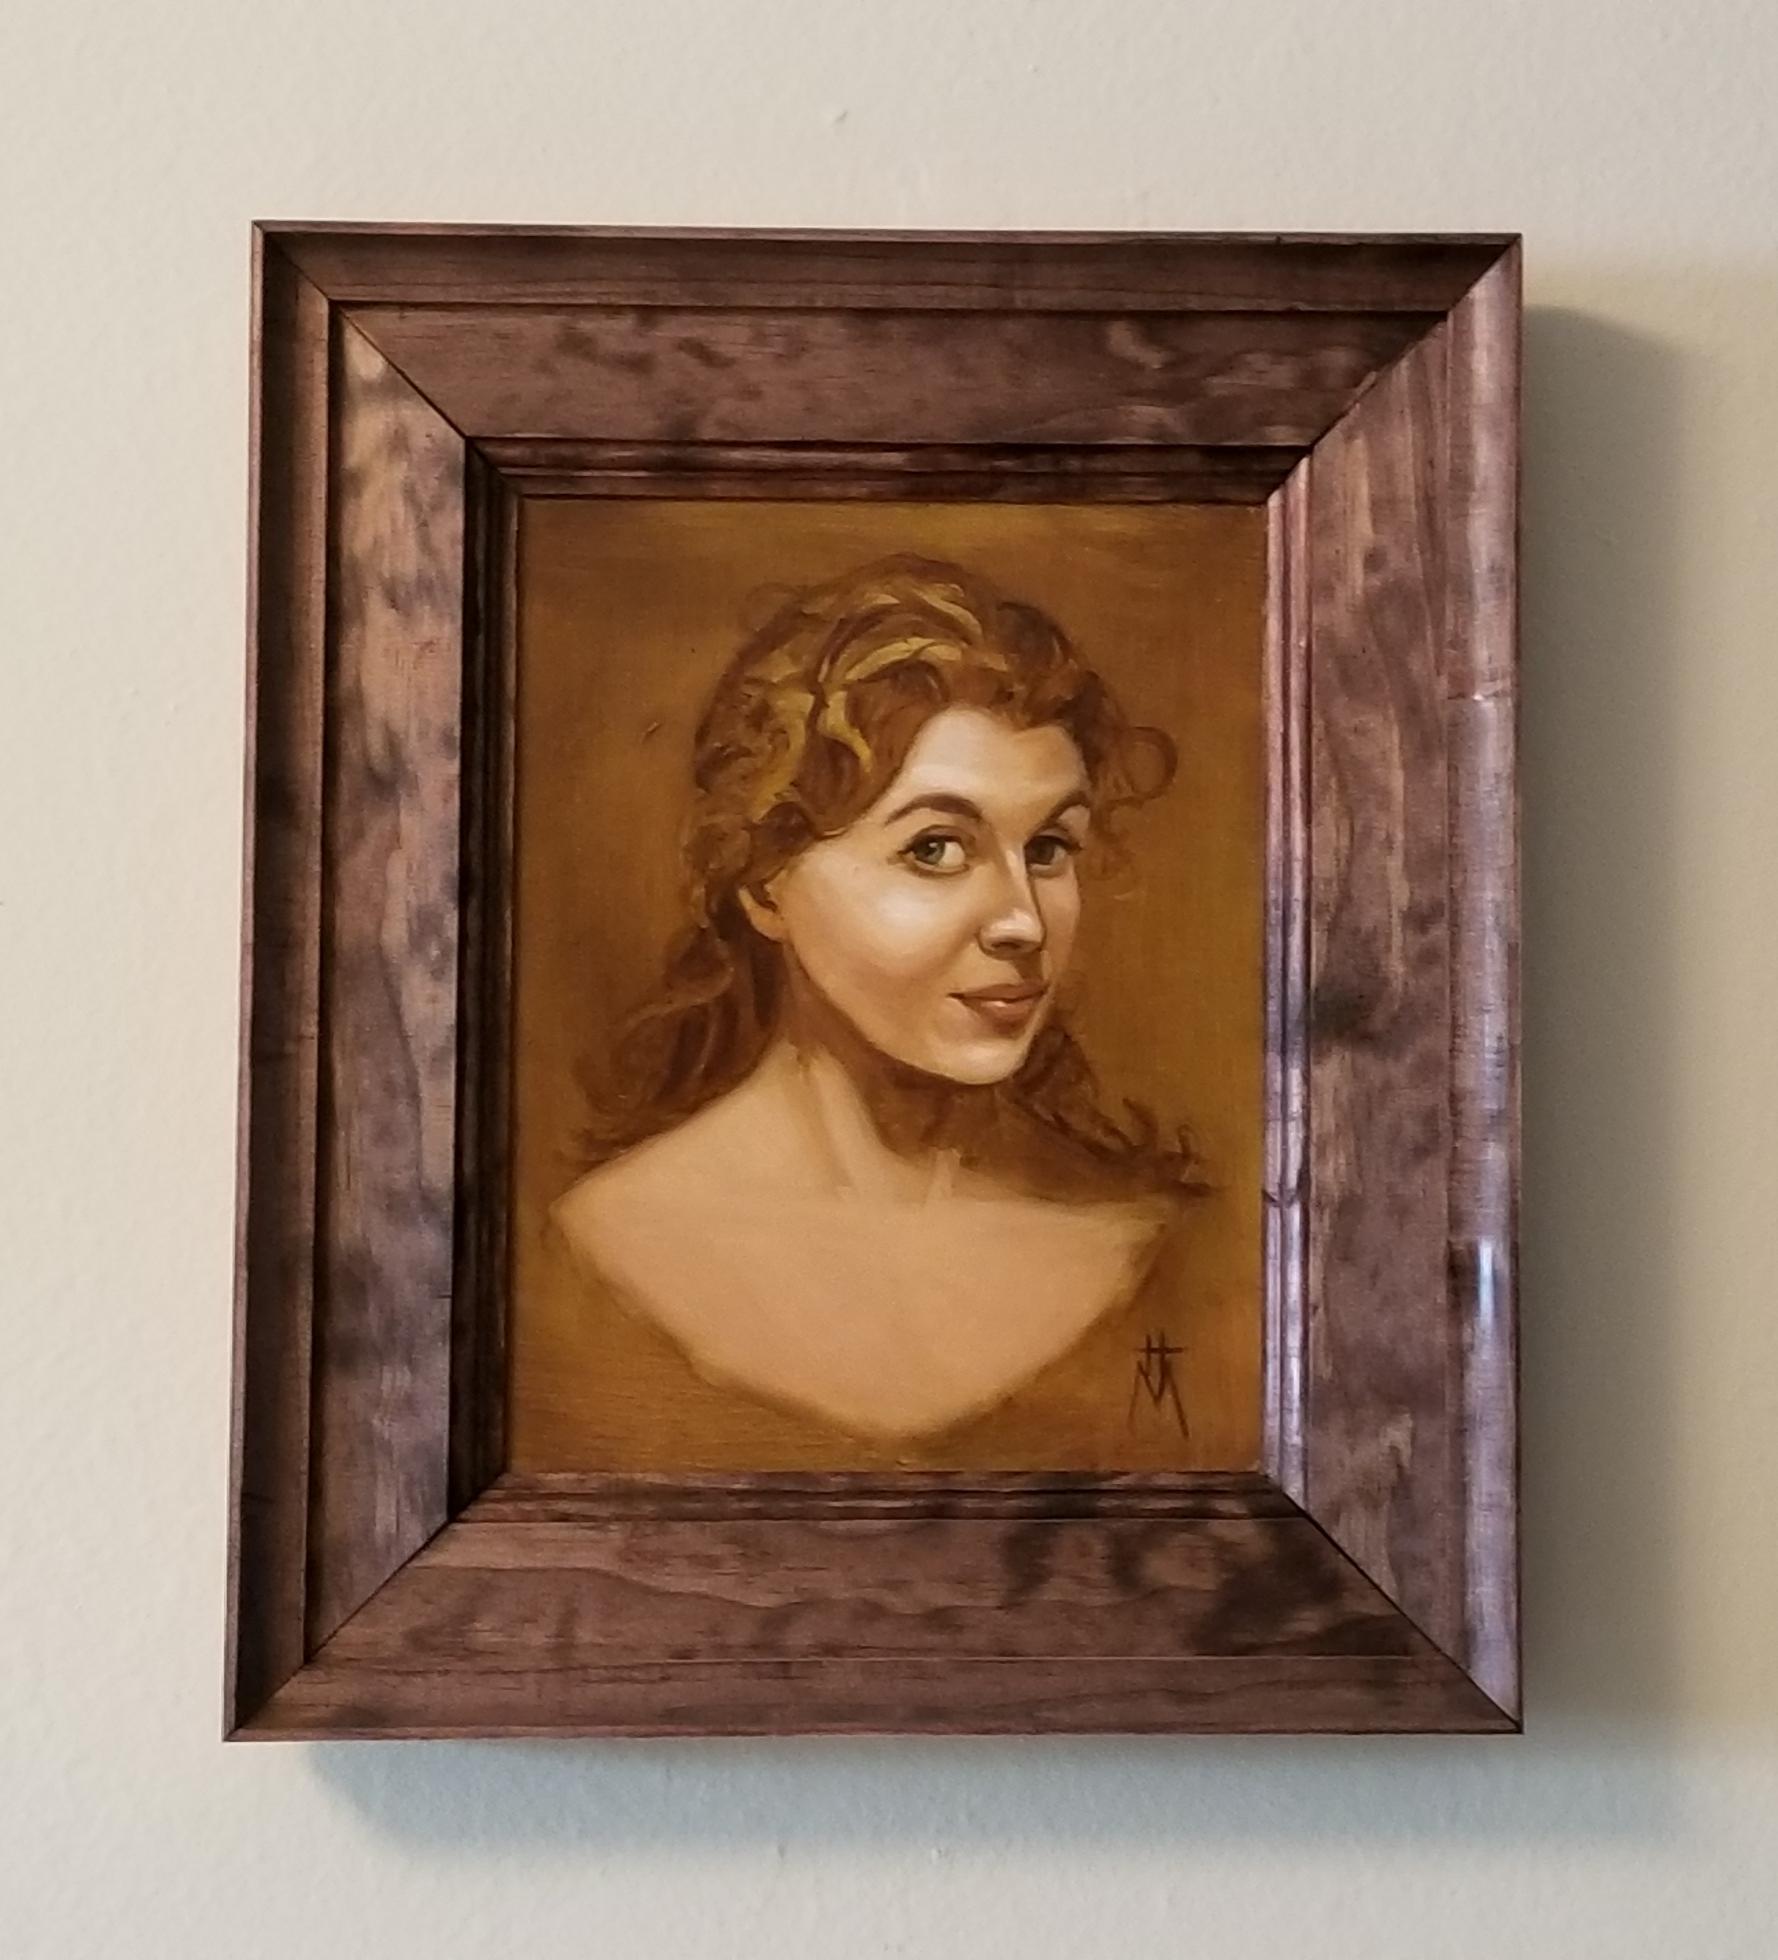 Custom Frames - All frames made by hand